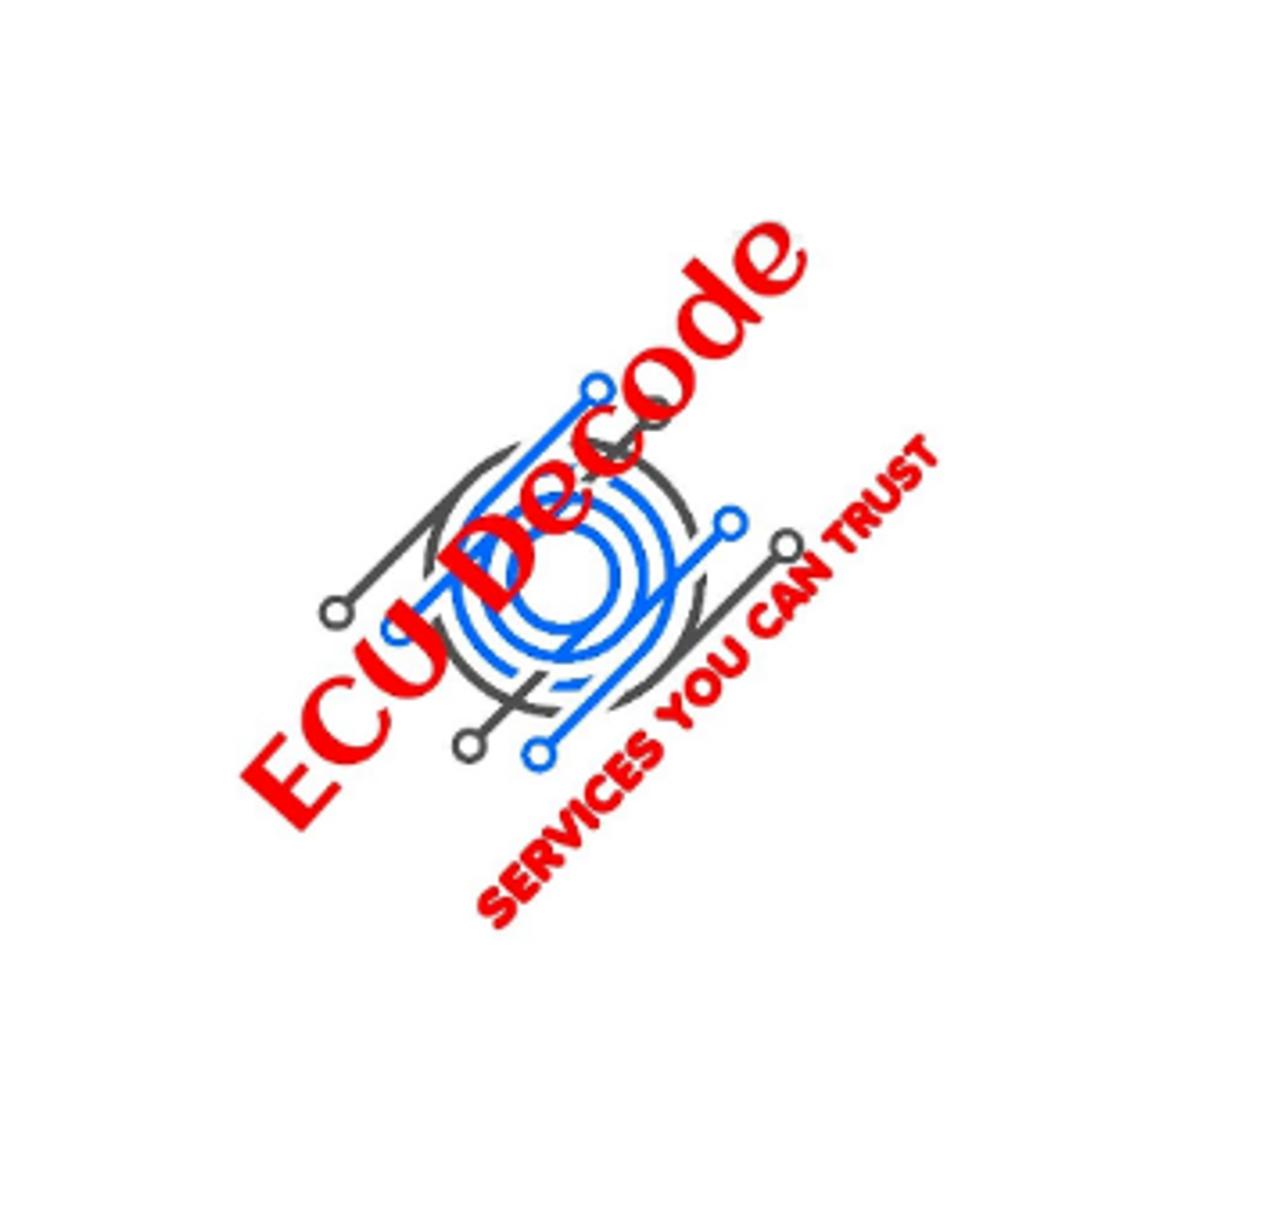 0 281 010 931 | 0281010931 | 1337648080  |  | EDC15C7 | Peugeot Citroen Fiat Diesel Engine ECU Cloning & Immobiliser Bypass Services